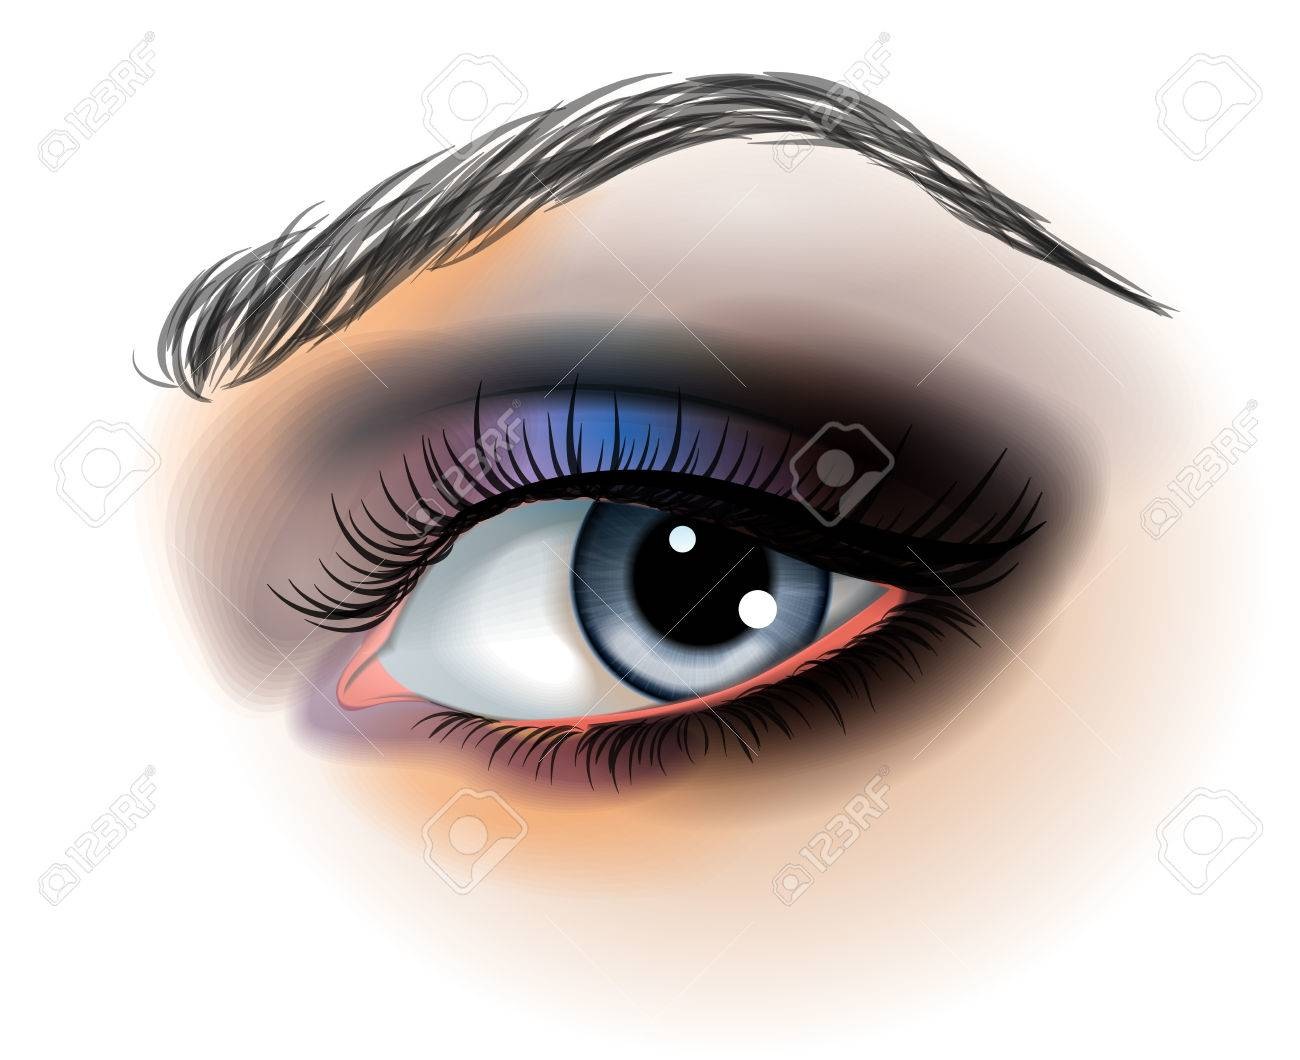 Eye make up illustration - 23650969